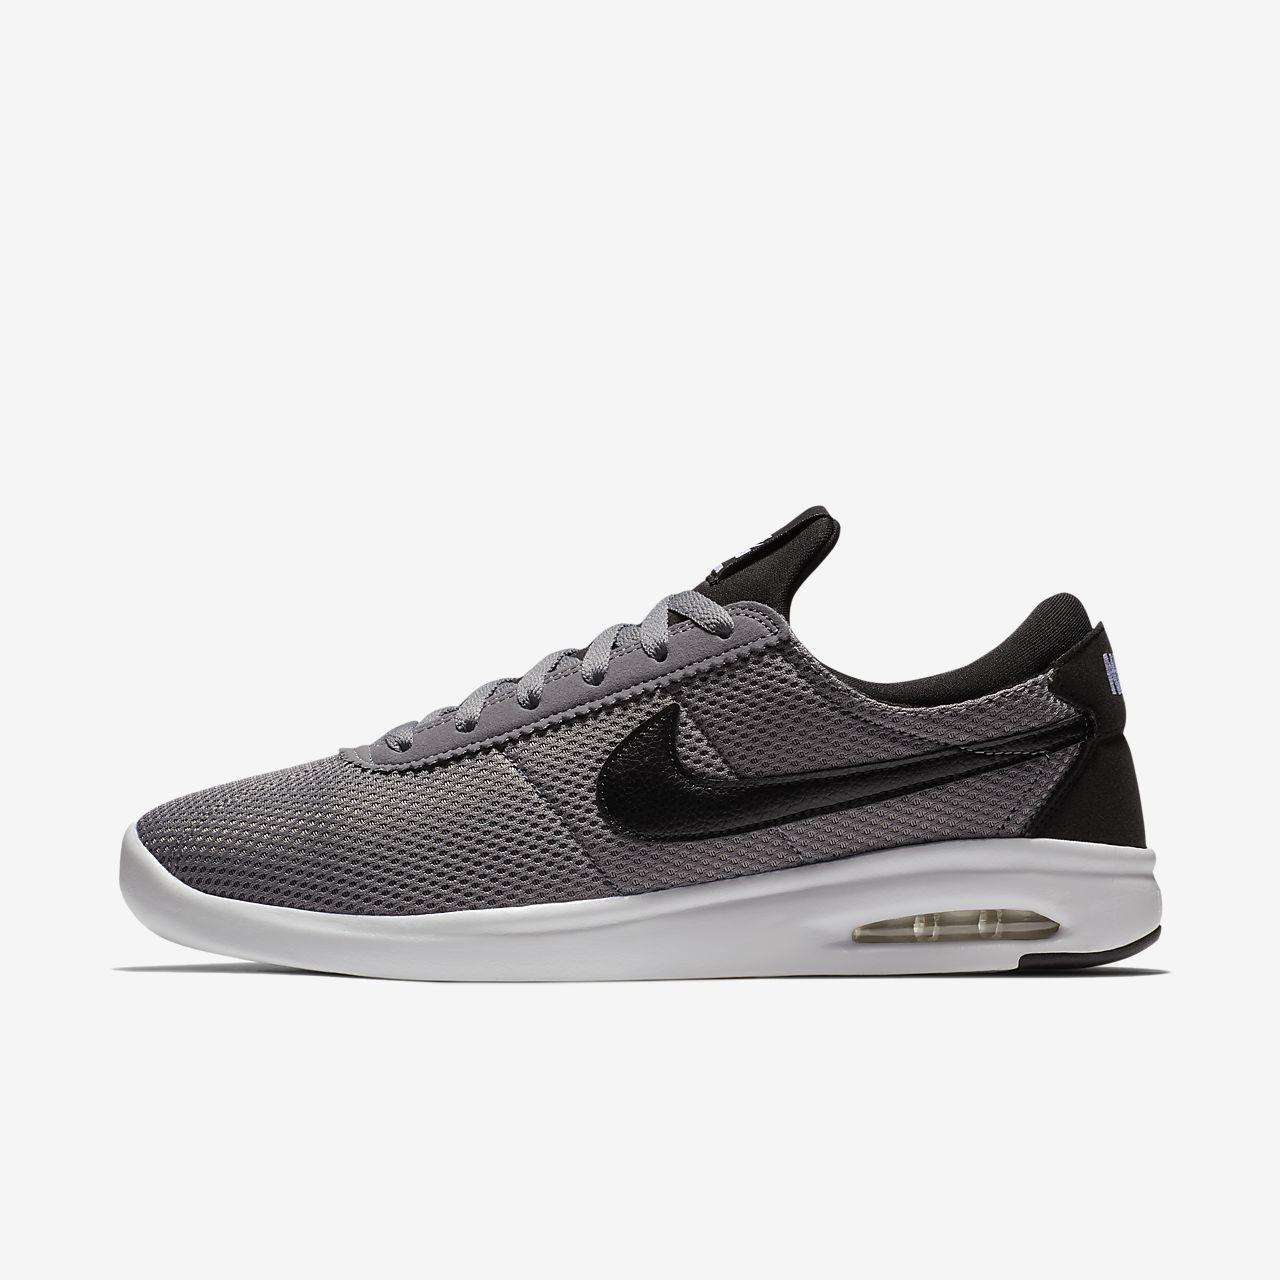 nike sb air max bruin vapor men s skateboarding shoe nike com